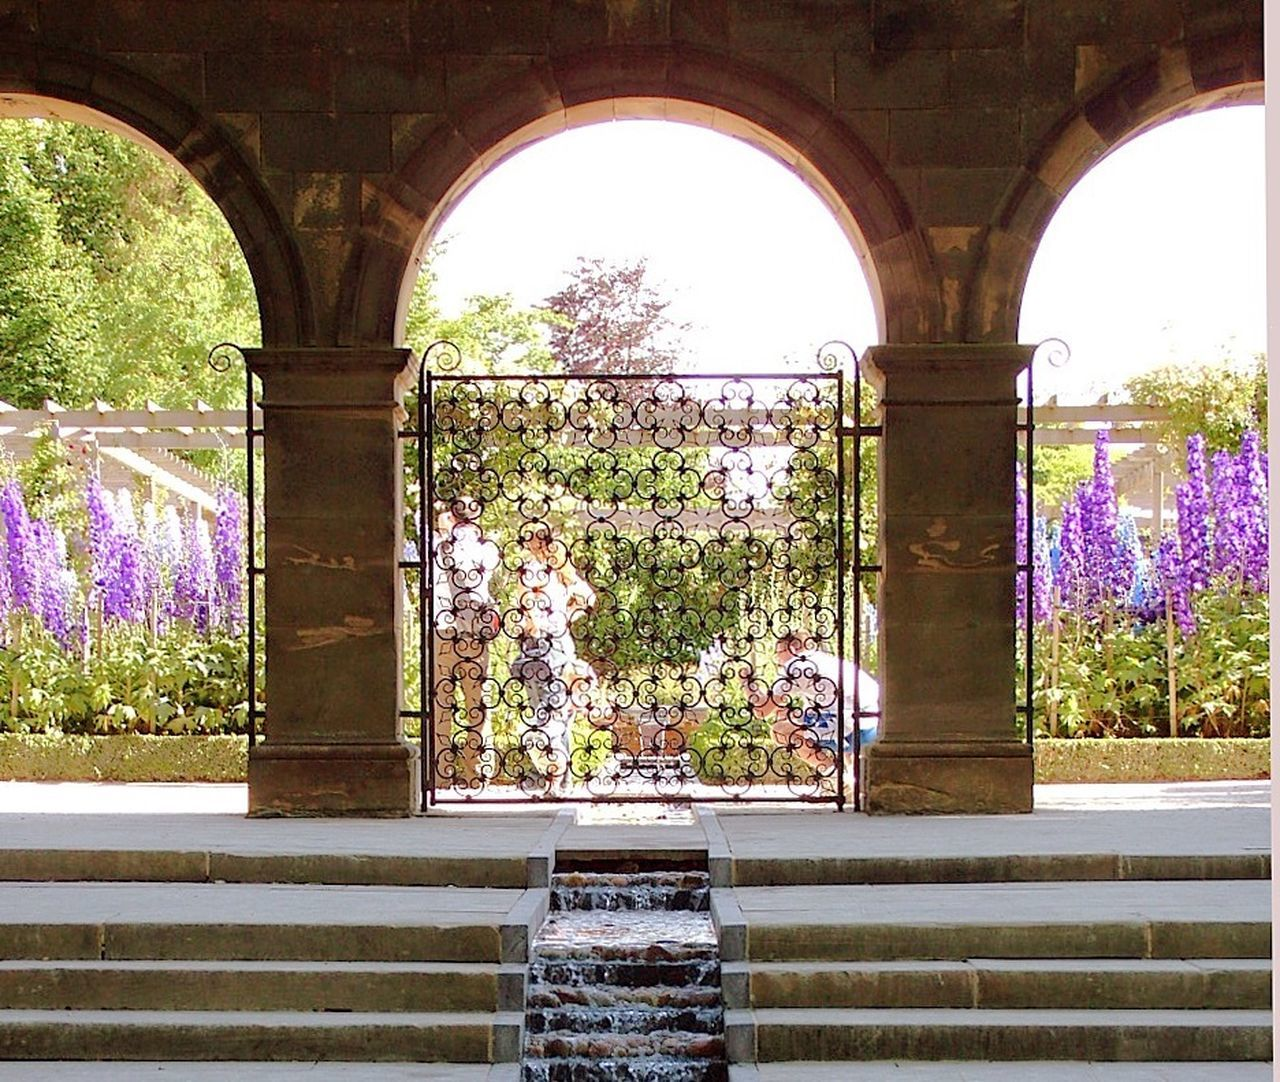 Arch Delphiniums Garden Garden Architecture Steps Wrought Iron Gate